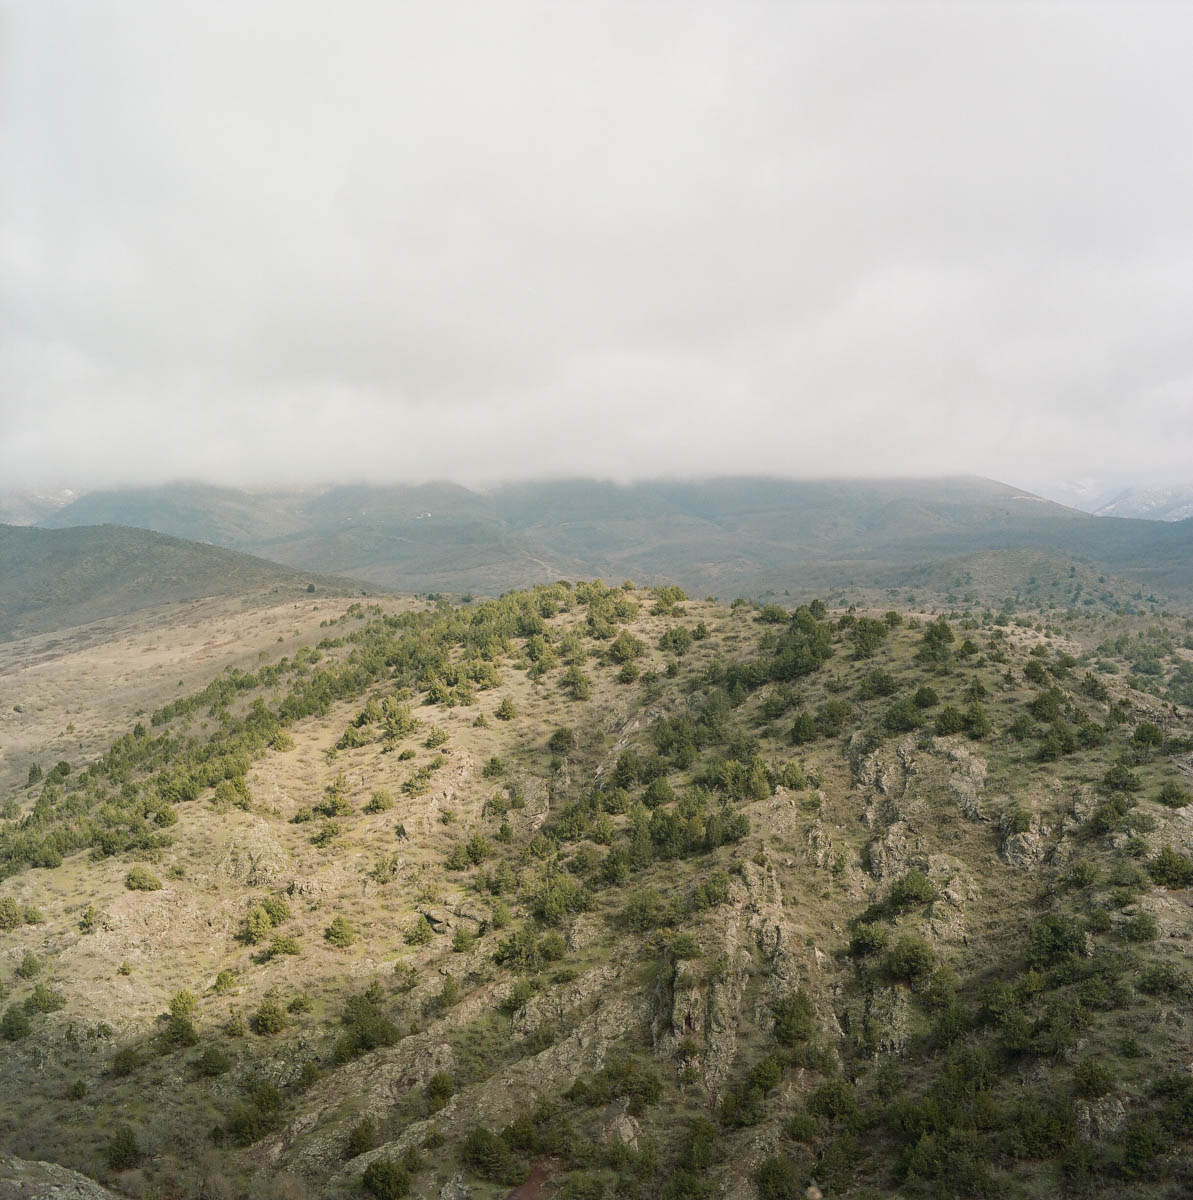 Looking across the valley from the Aghavnatun minefield. [Eva Clifford/Al Jazeera]